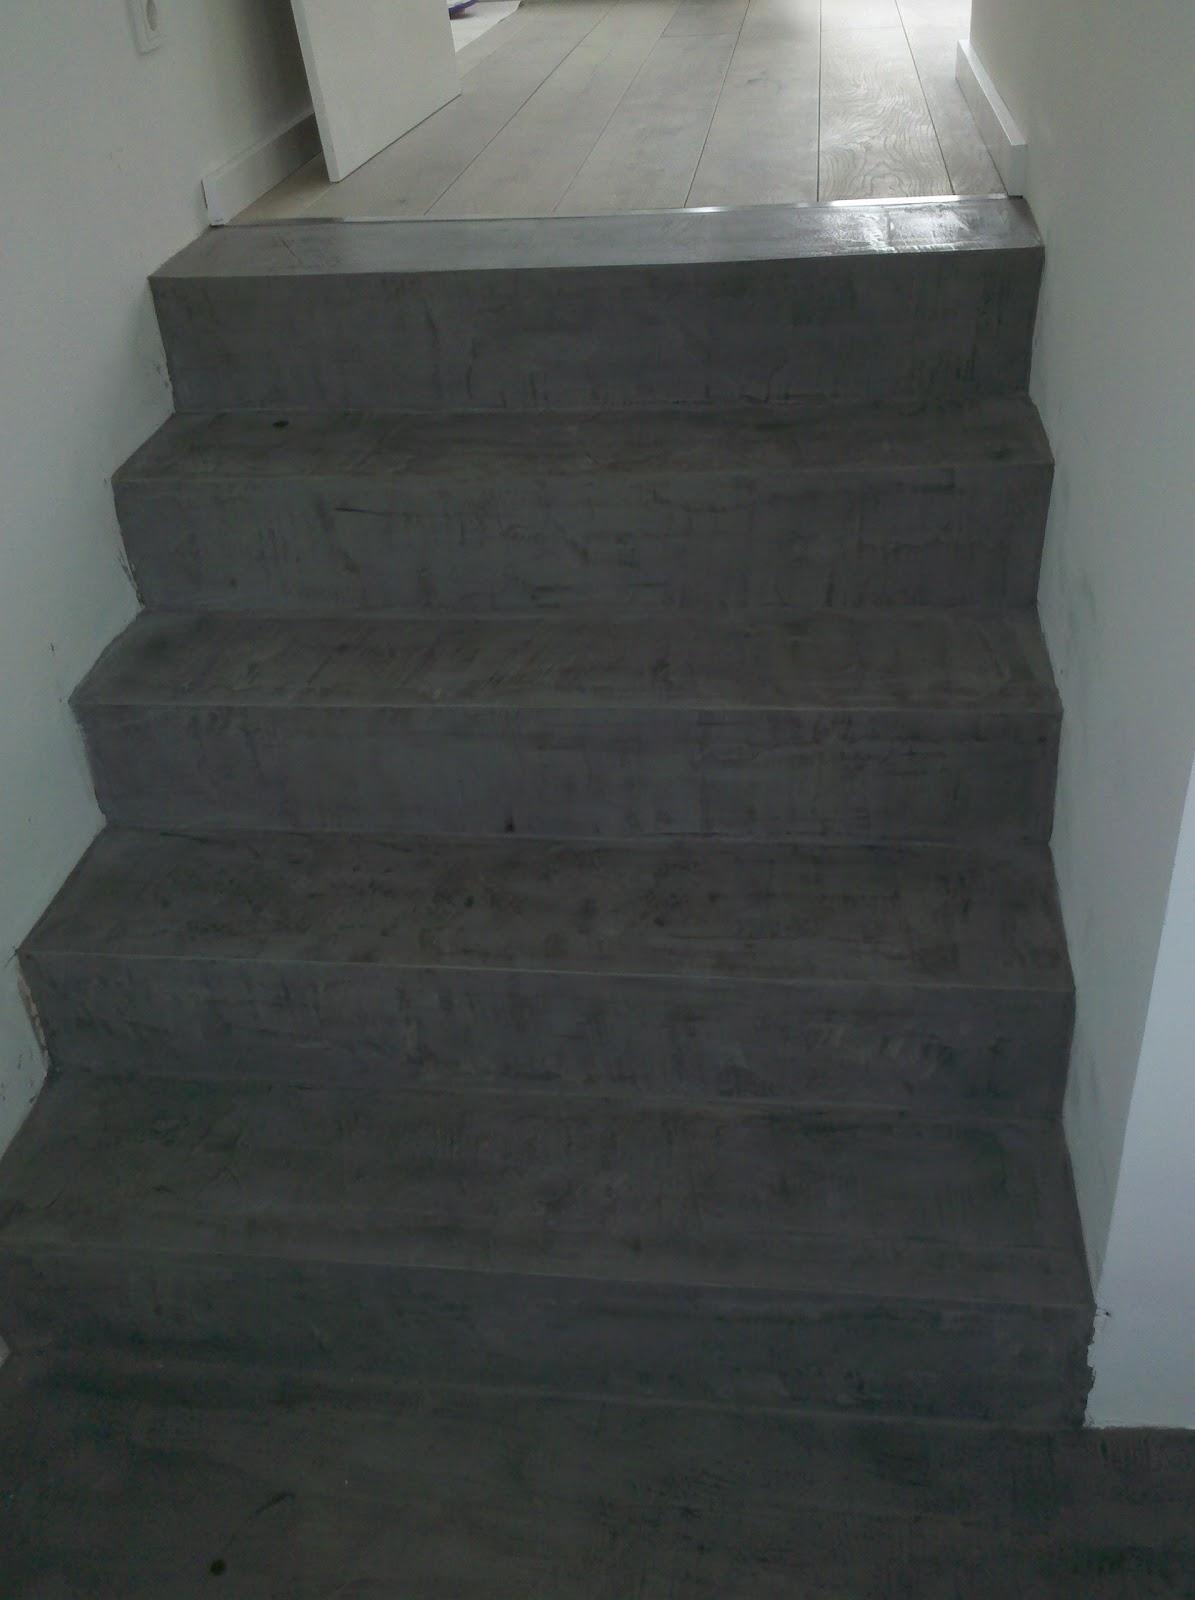 wand wohndesign beton cire beton floor treppenbeschichtung in betonoptik. Black Bedroom Furniture Sets. Home Design Ideas